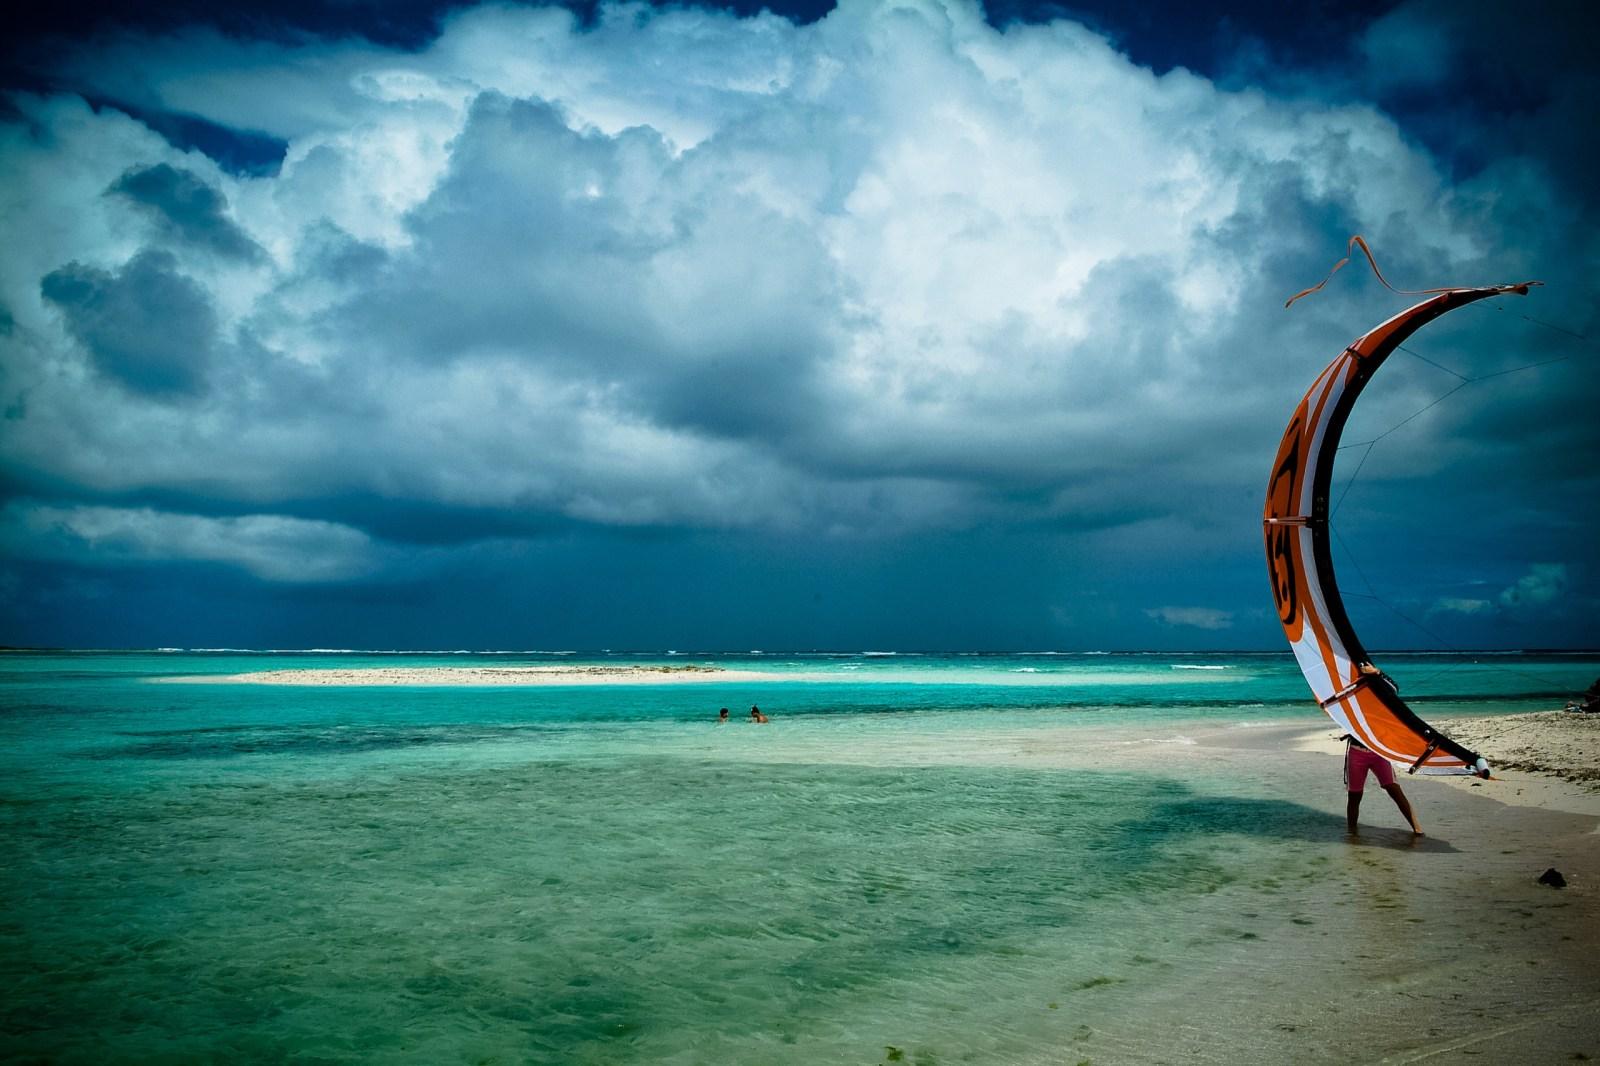 Kite @LosRoques ©lucaromanopix